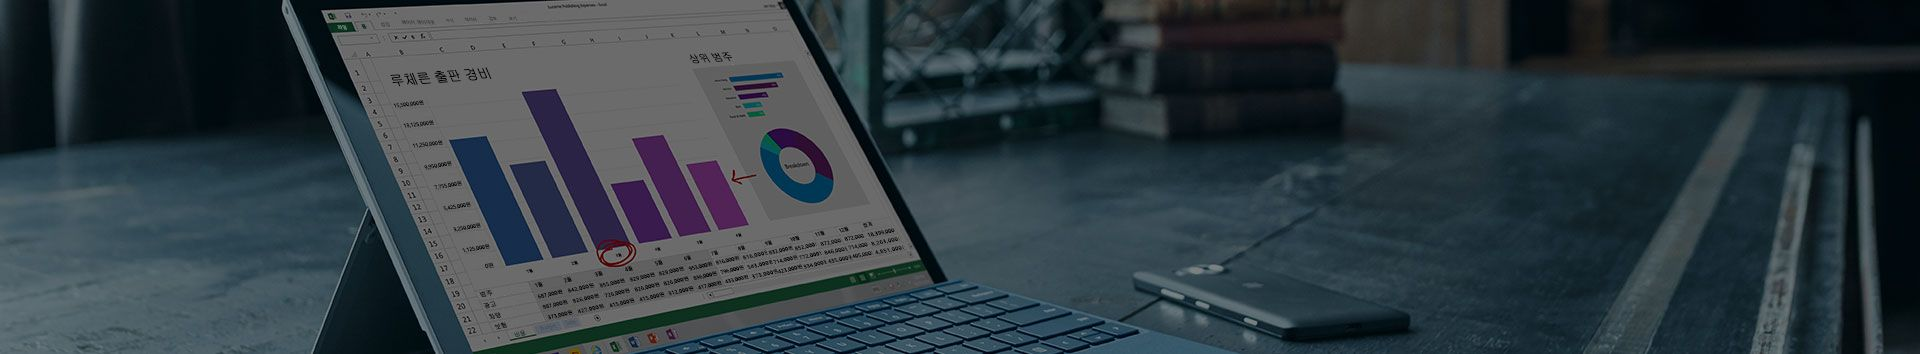 Microsoft Excel 이미지에 지출 보고서가 표시된 Microsoft Surface 태블릿